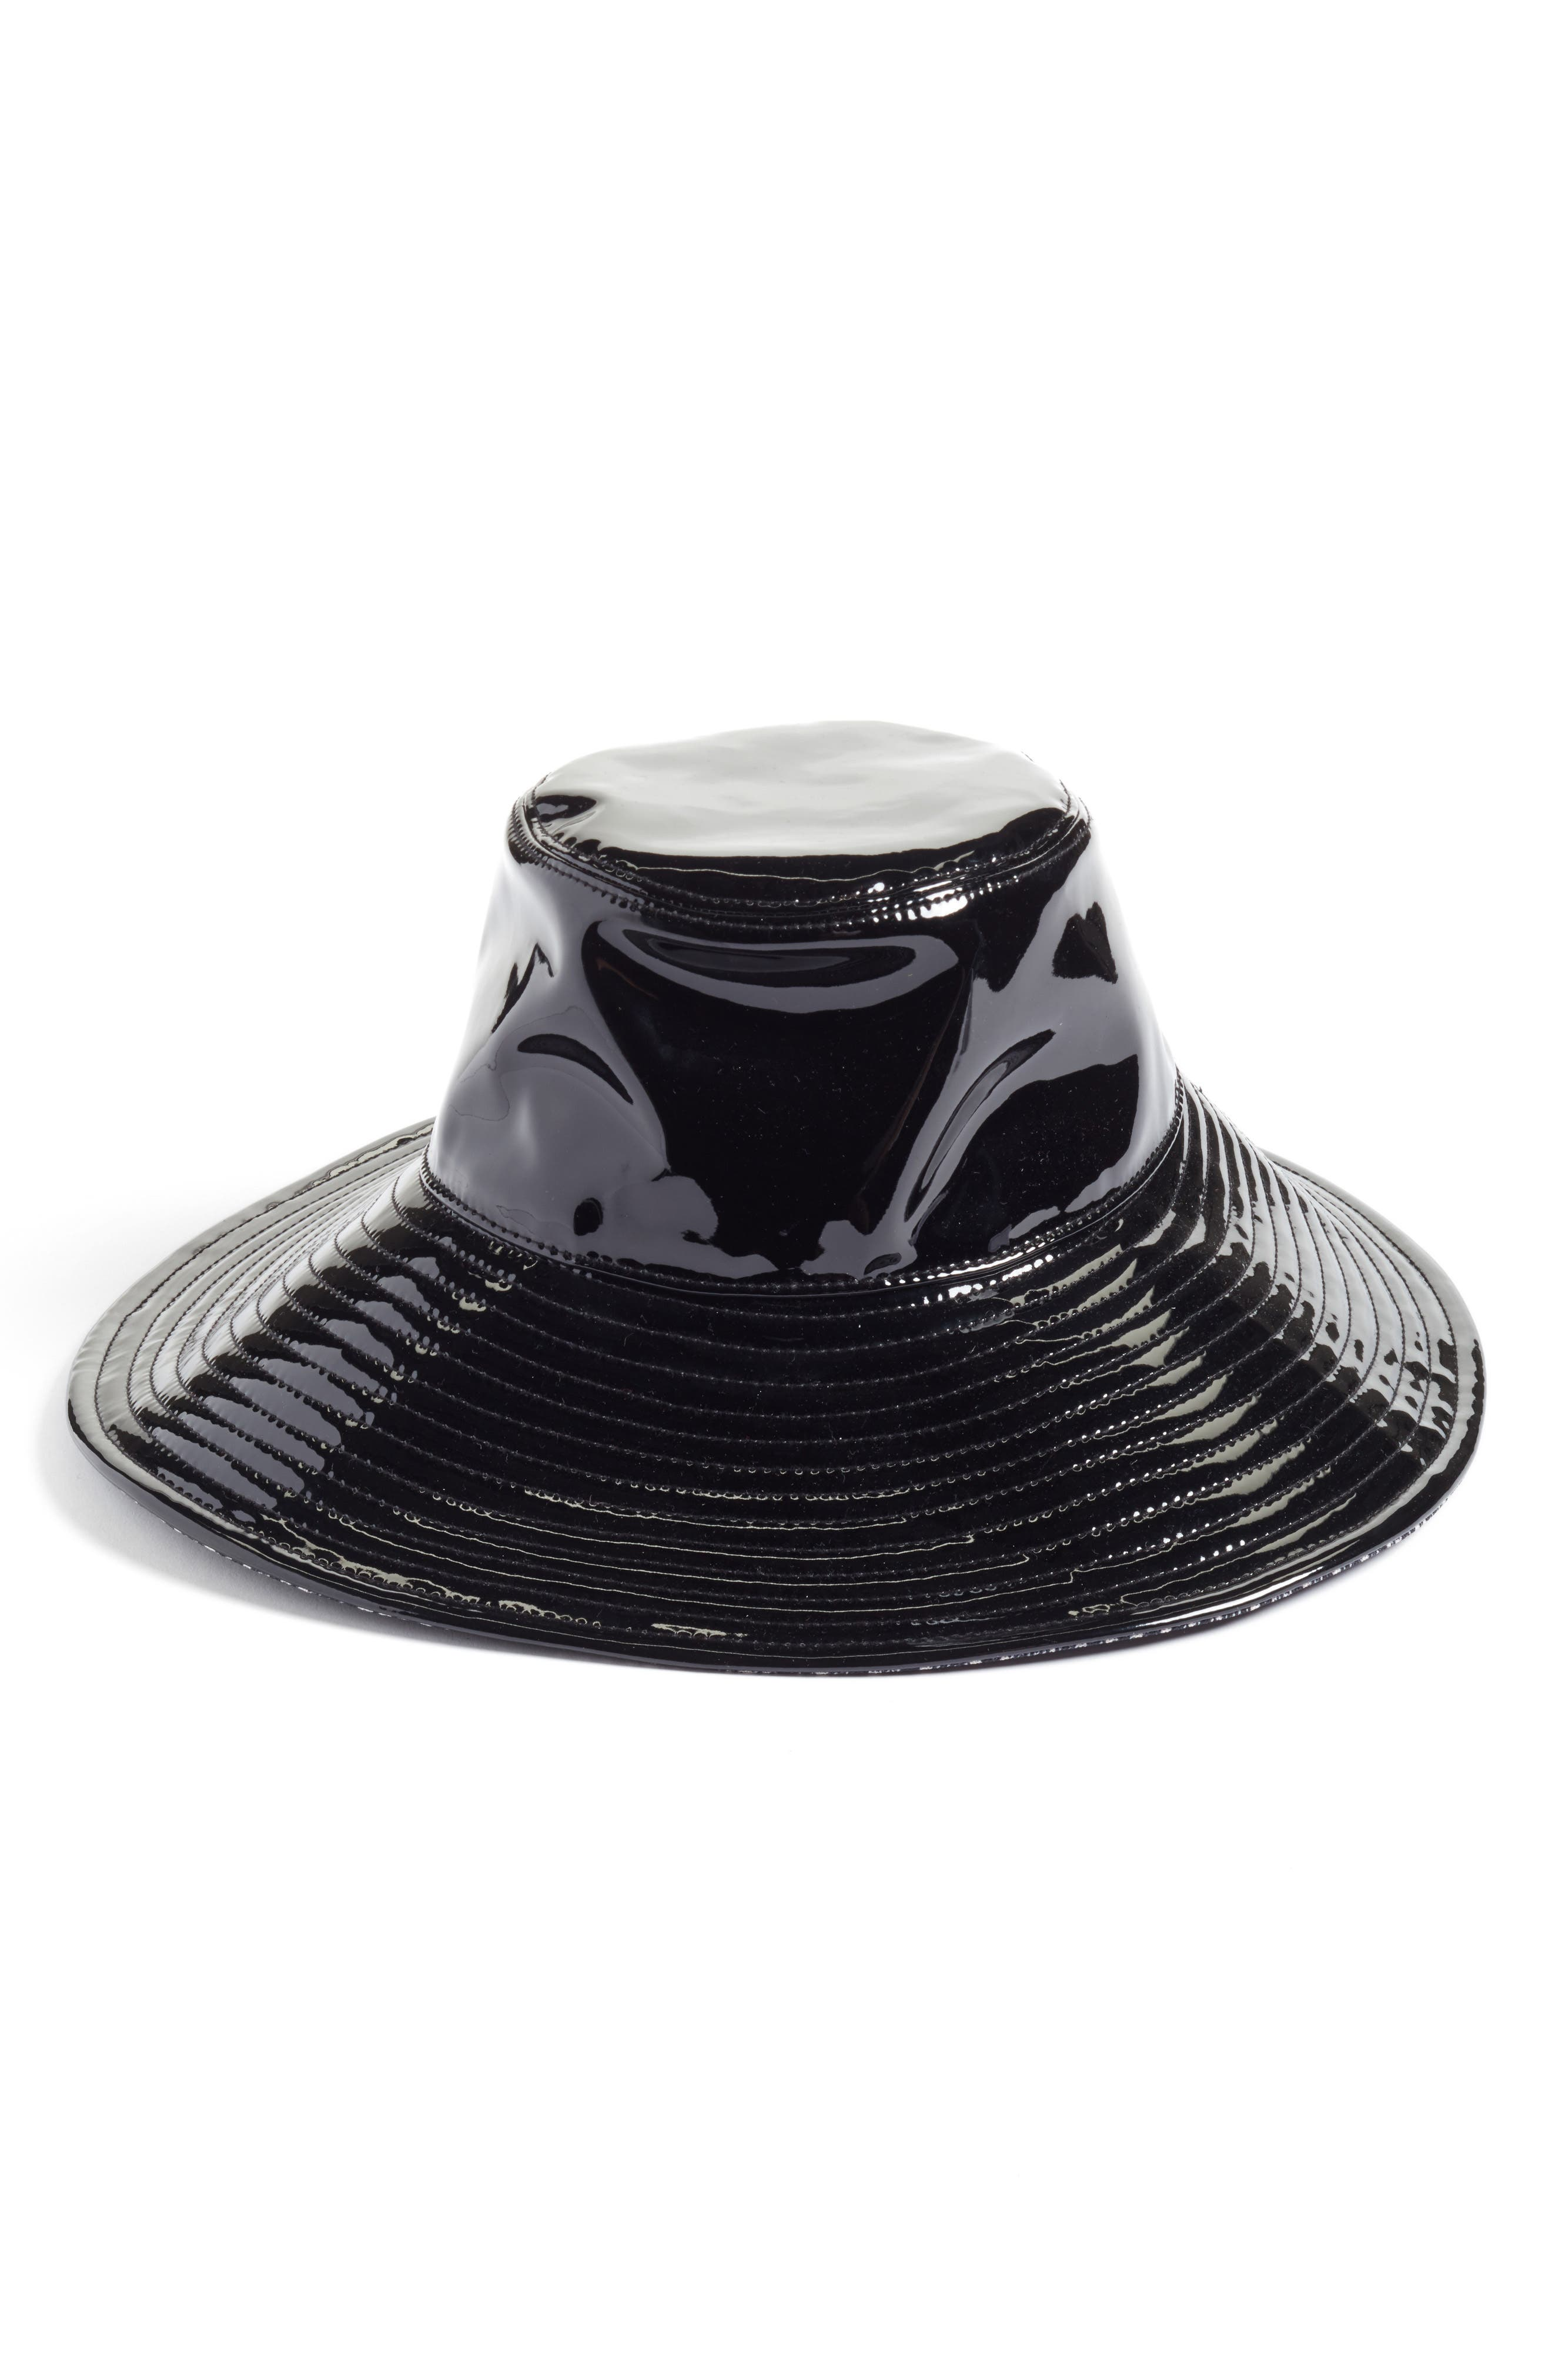 Alternate Image 1 Selected - Eric Javits Driptidoo Patent Bucket Rain Hat